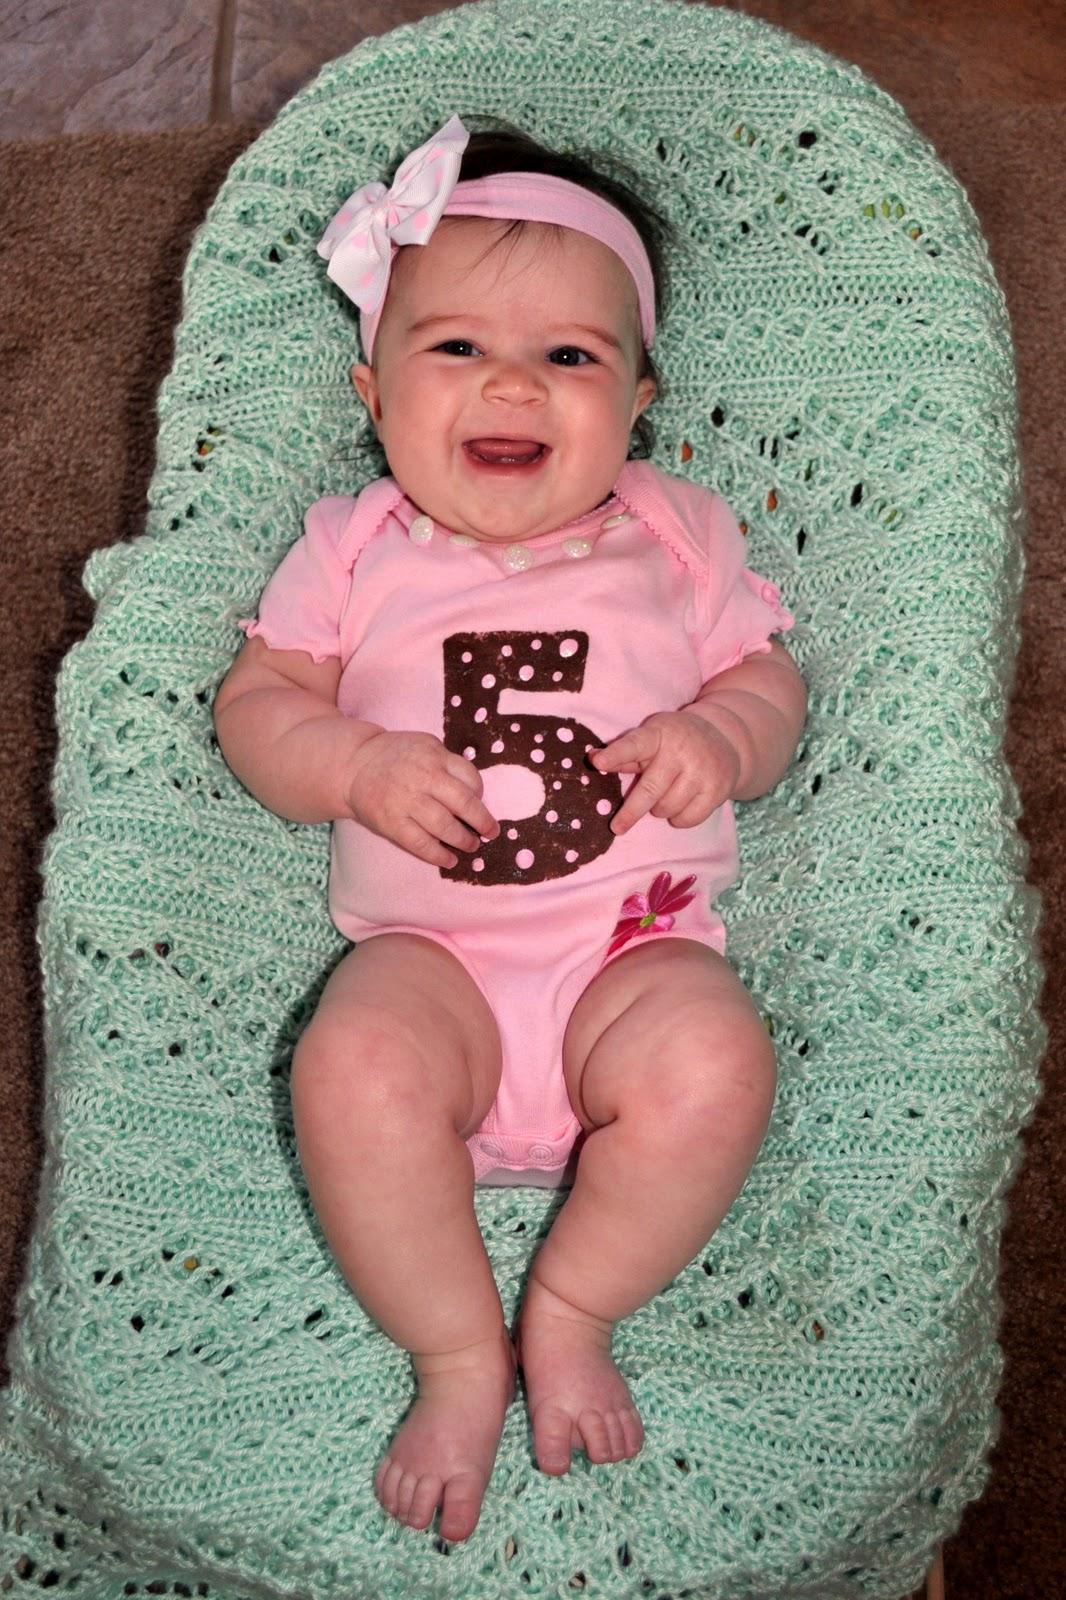 Tu bebe de 5 meses - Bebe de 6 meses ...